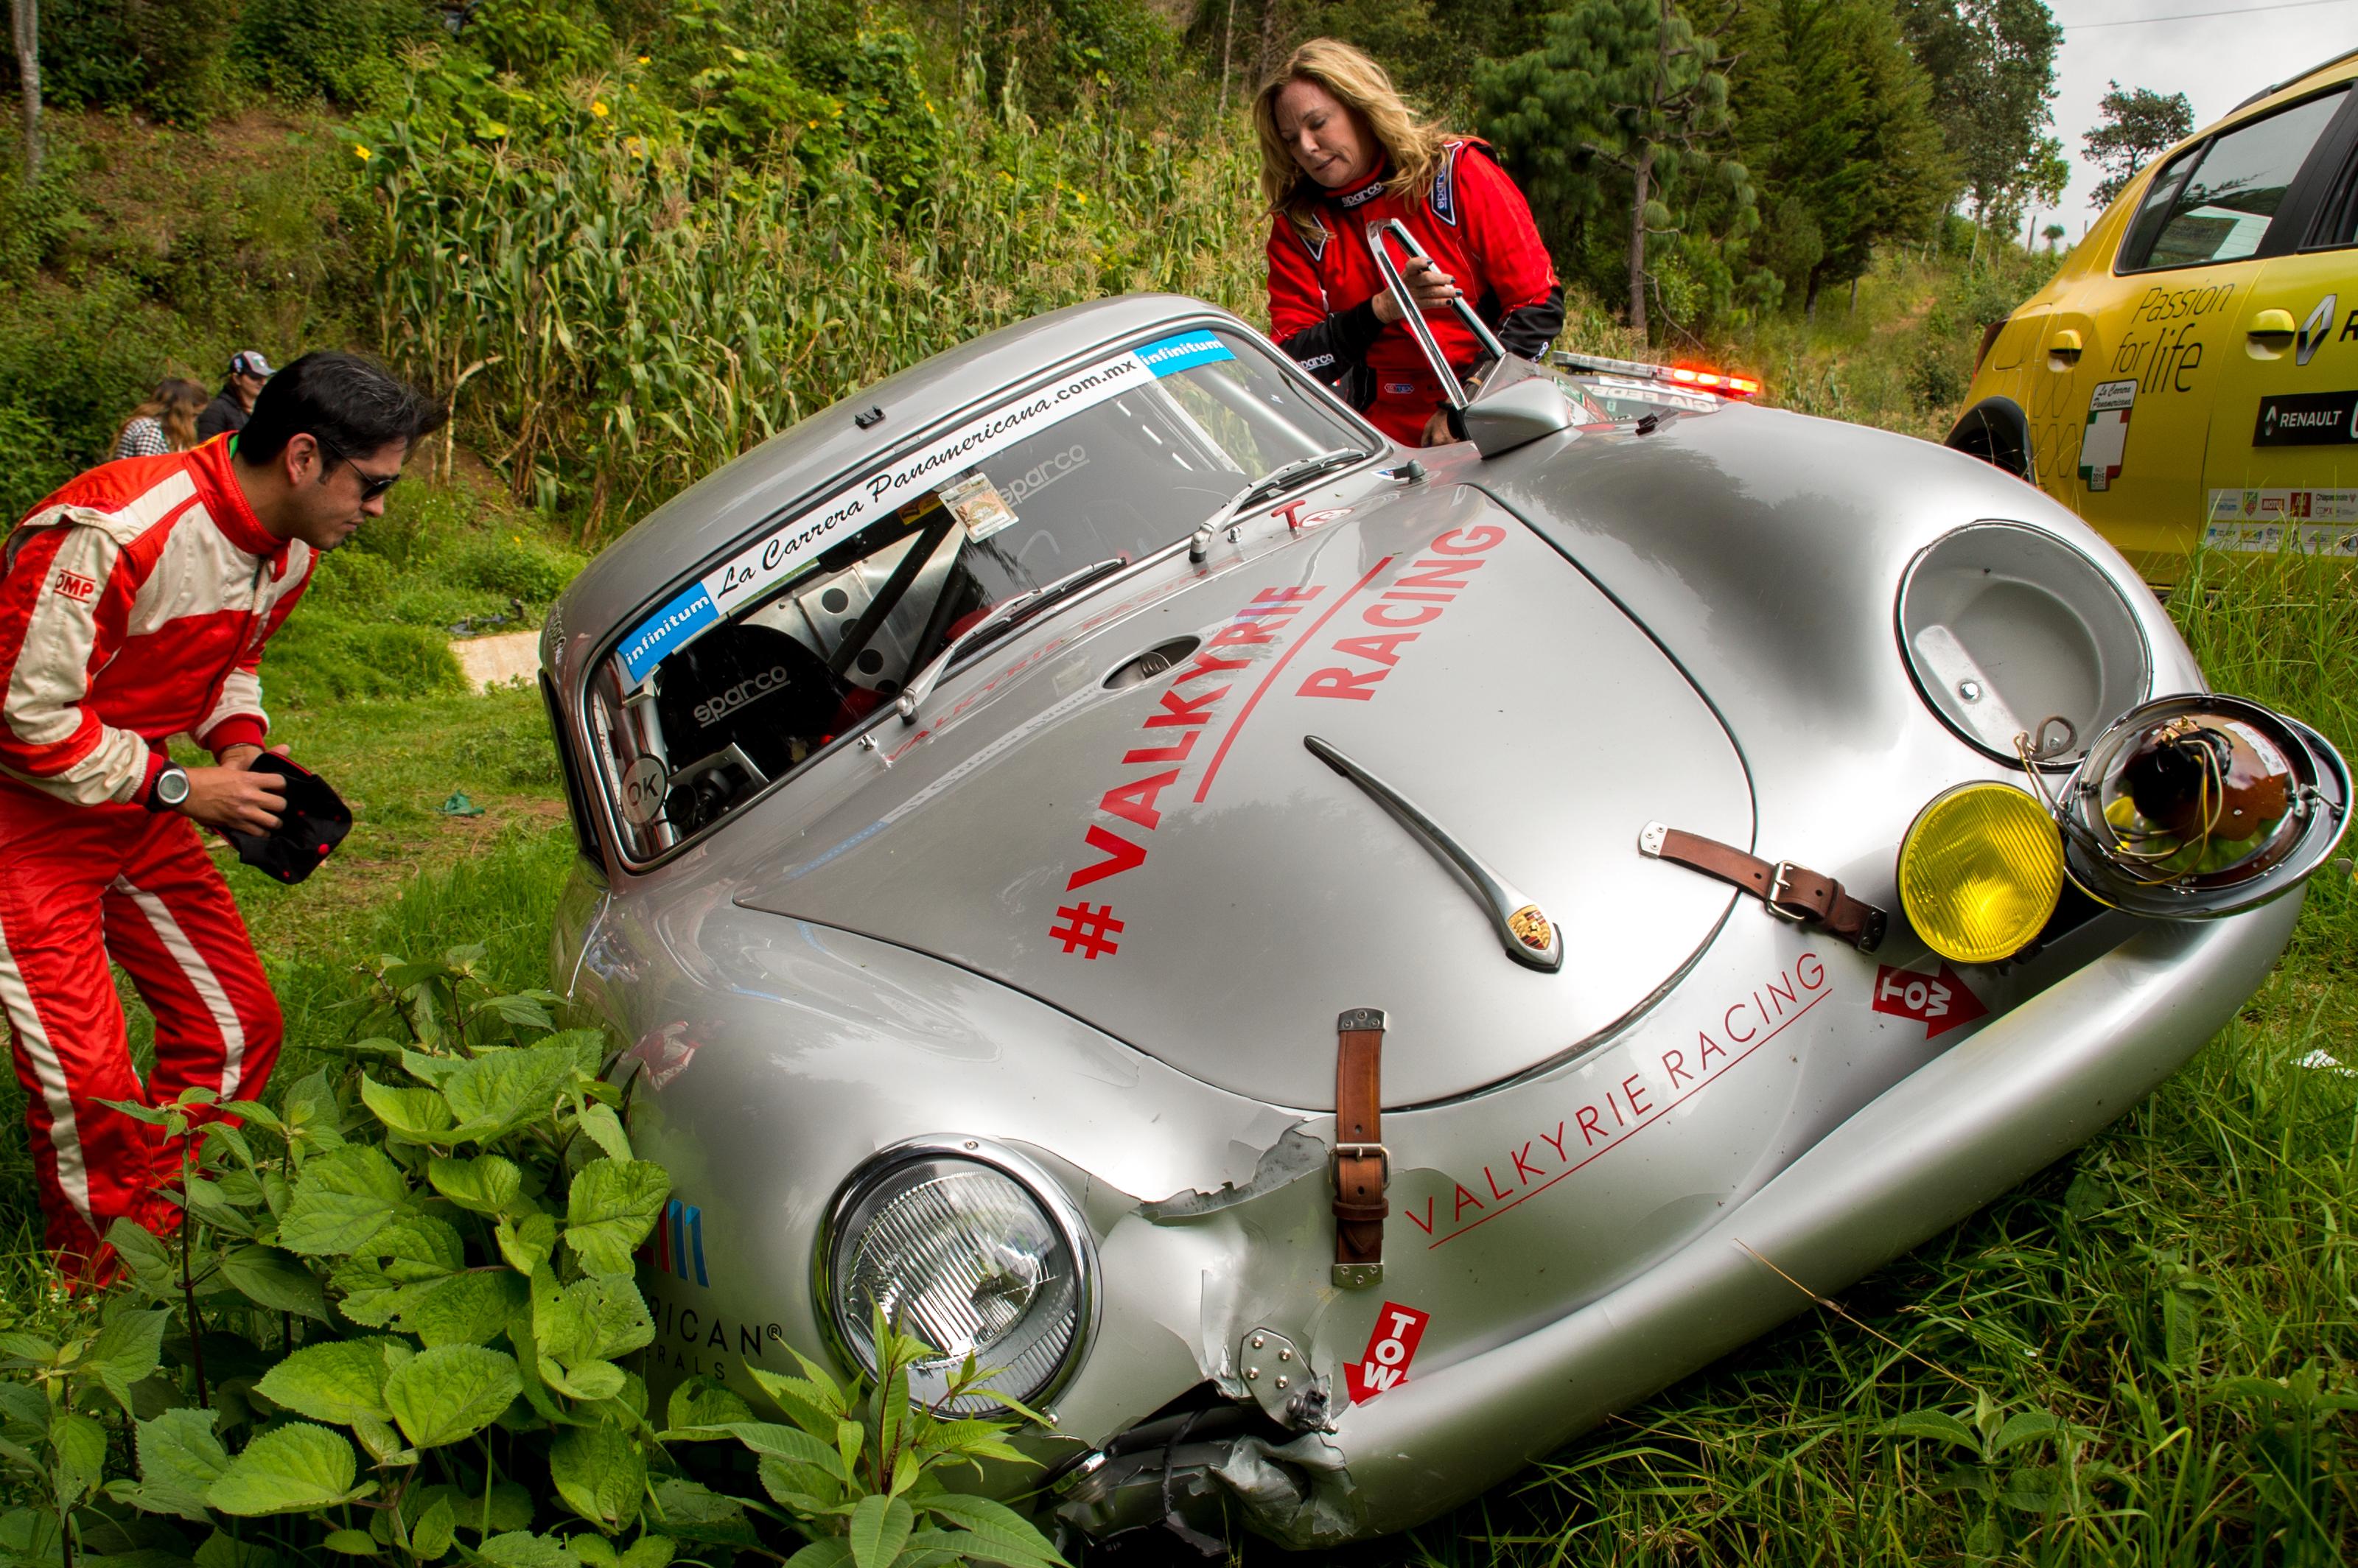 Renée Brinkerhoff and navigator Roberto Mendoza survey damage to the 356 after a crash in La Carrera Panamericana 2015.